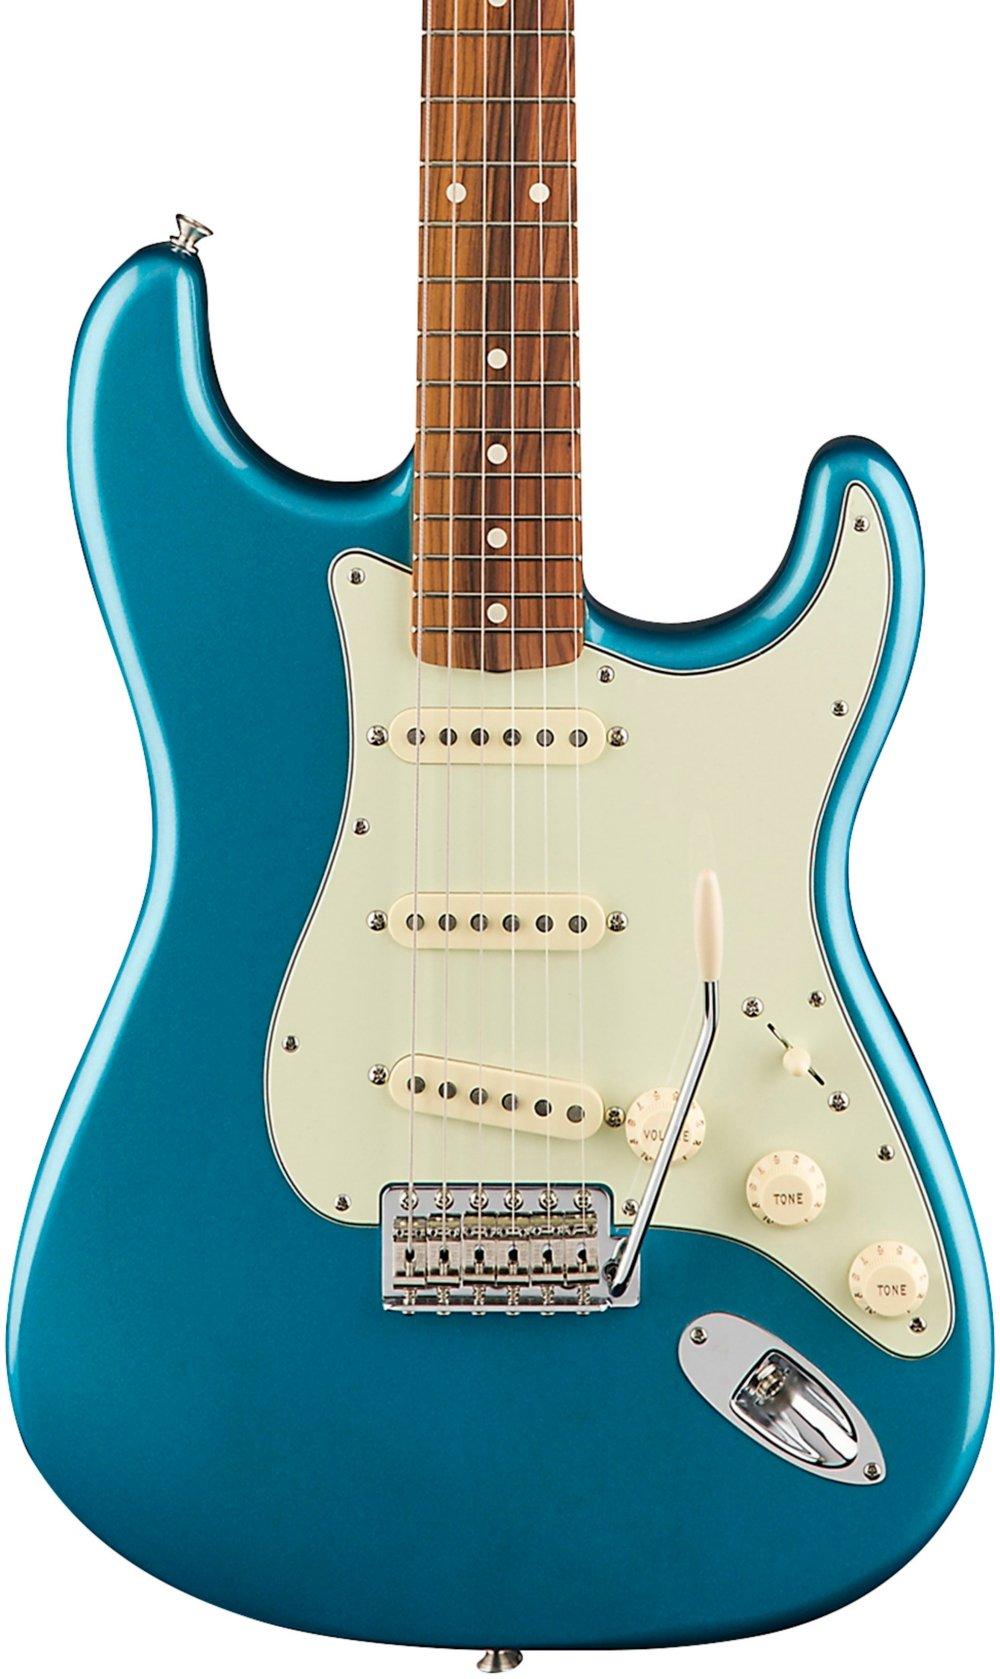 Cheap Fender Classic Series 60 s Stratocaster Electric Guitar - Pau Ferro Fingerboard - Lake Placid Blue Black Friday & Cyber Monday 2019